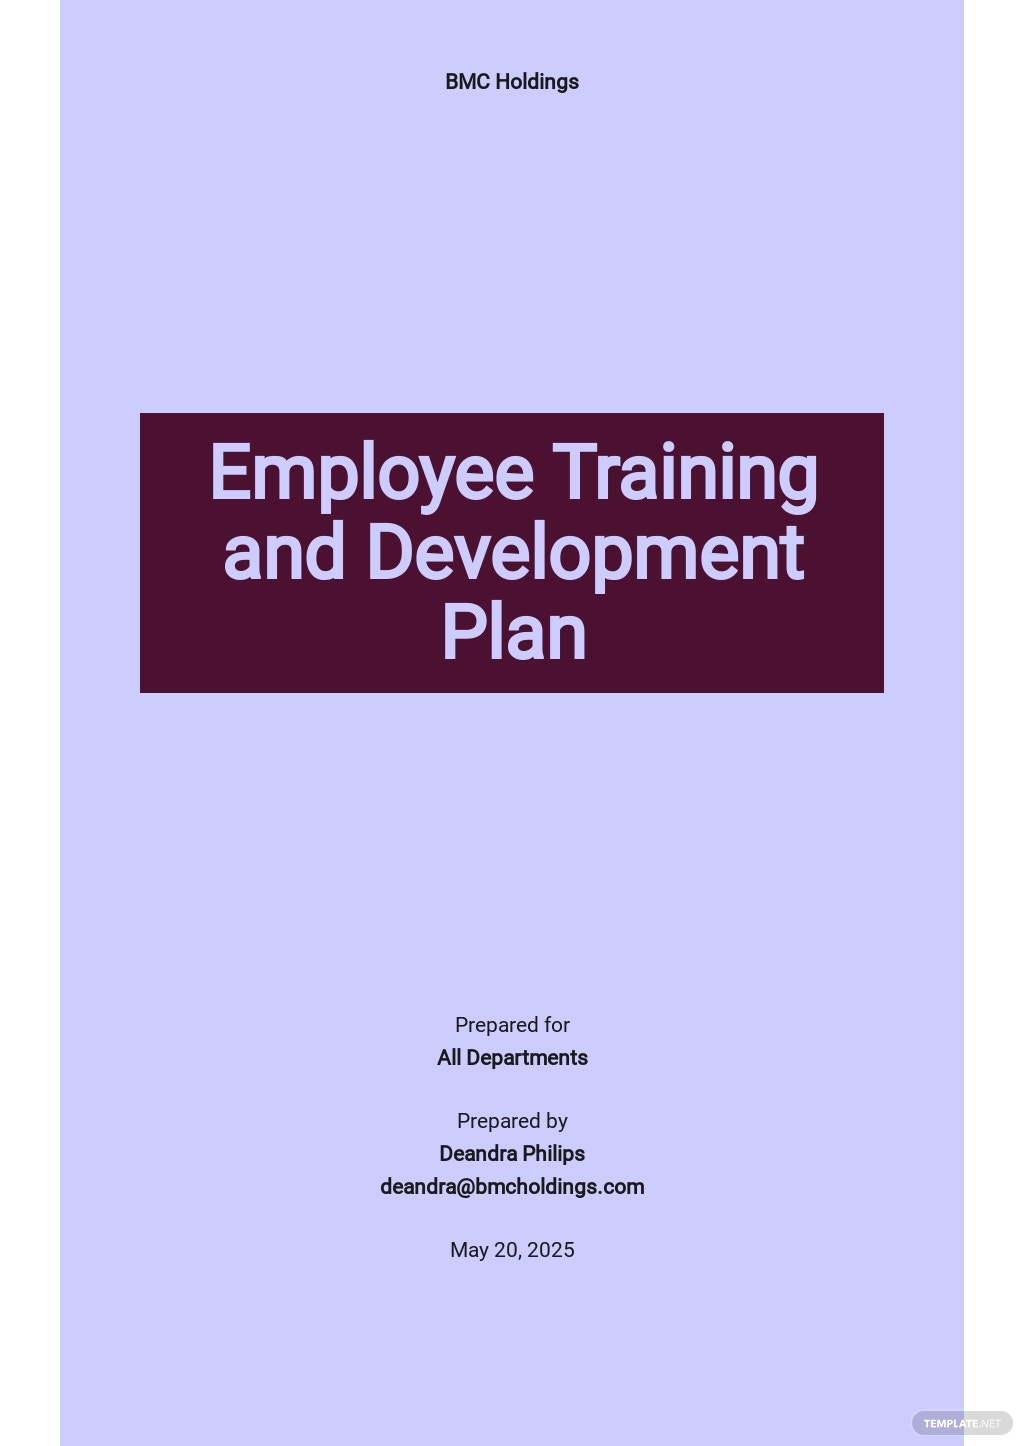 Employee Training and Development Plan Template   Word   Google Docs